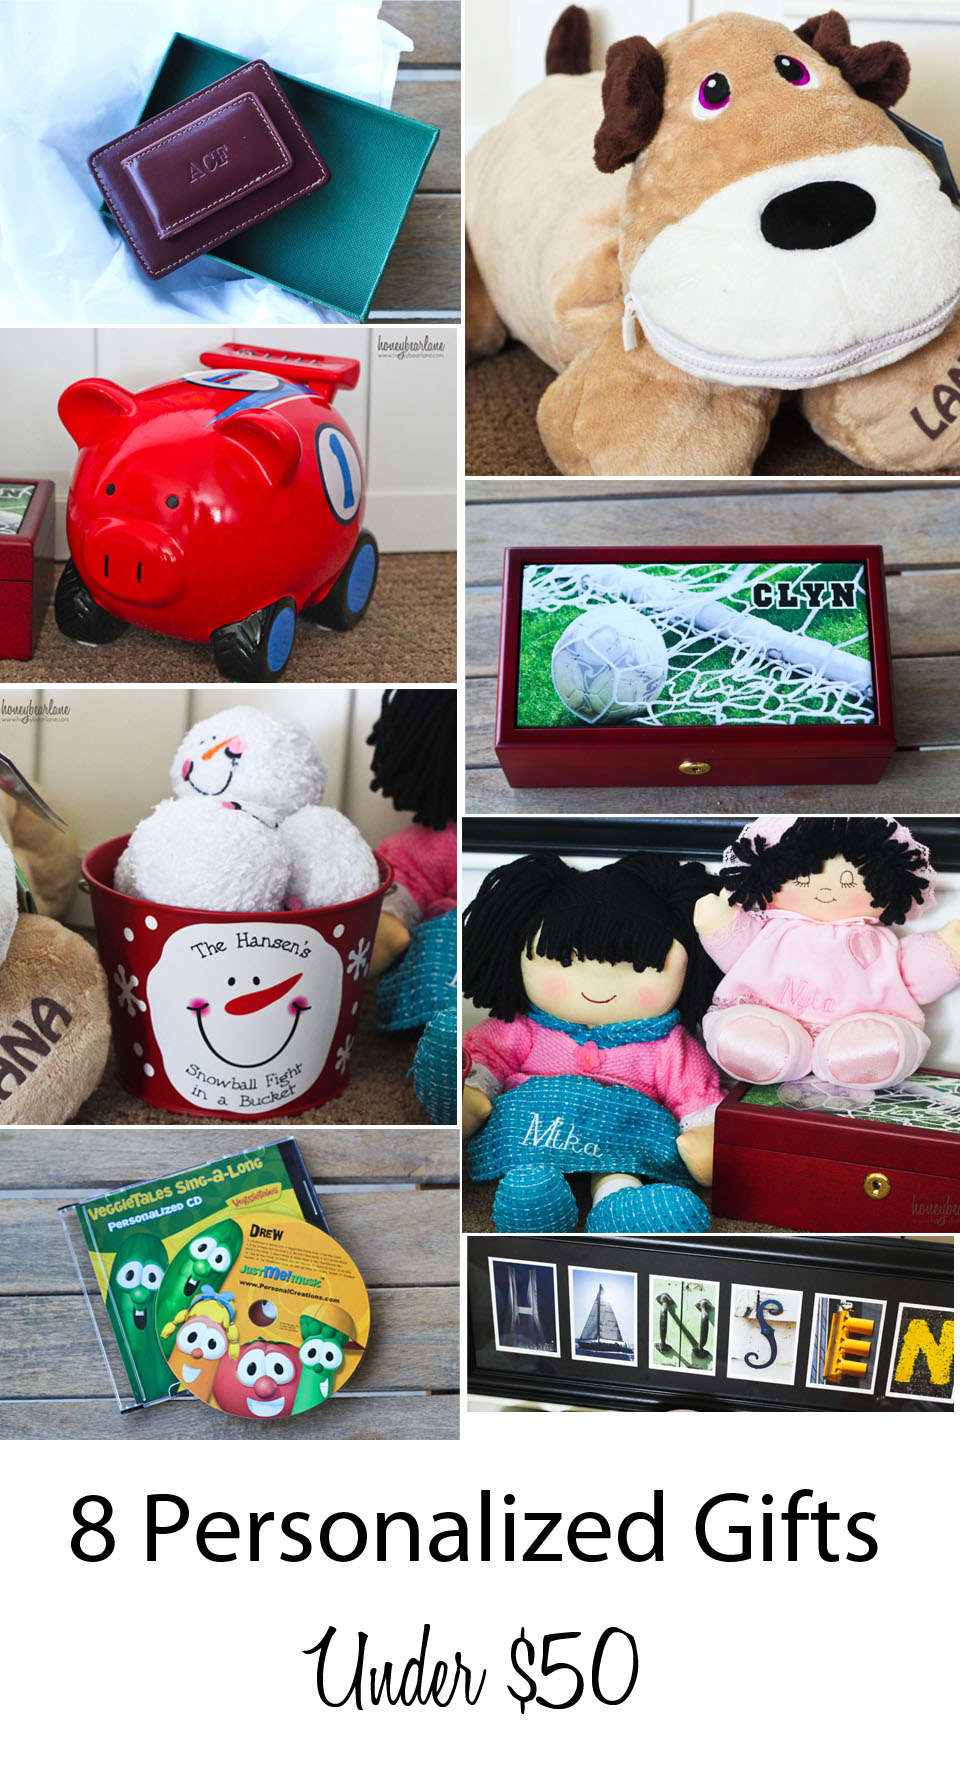 8 Personalized Gift Ideas Under 50 HoneyBear Lane